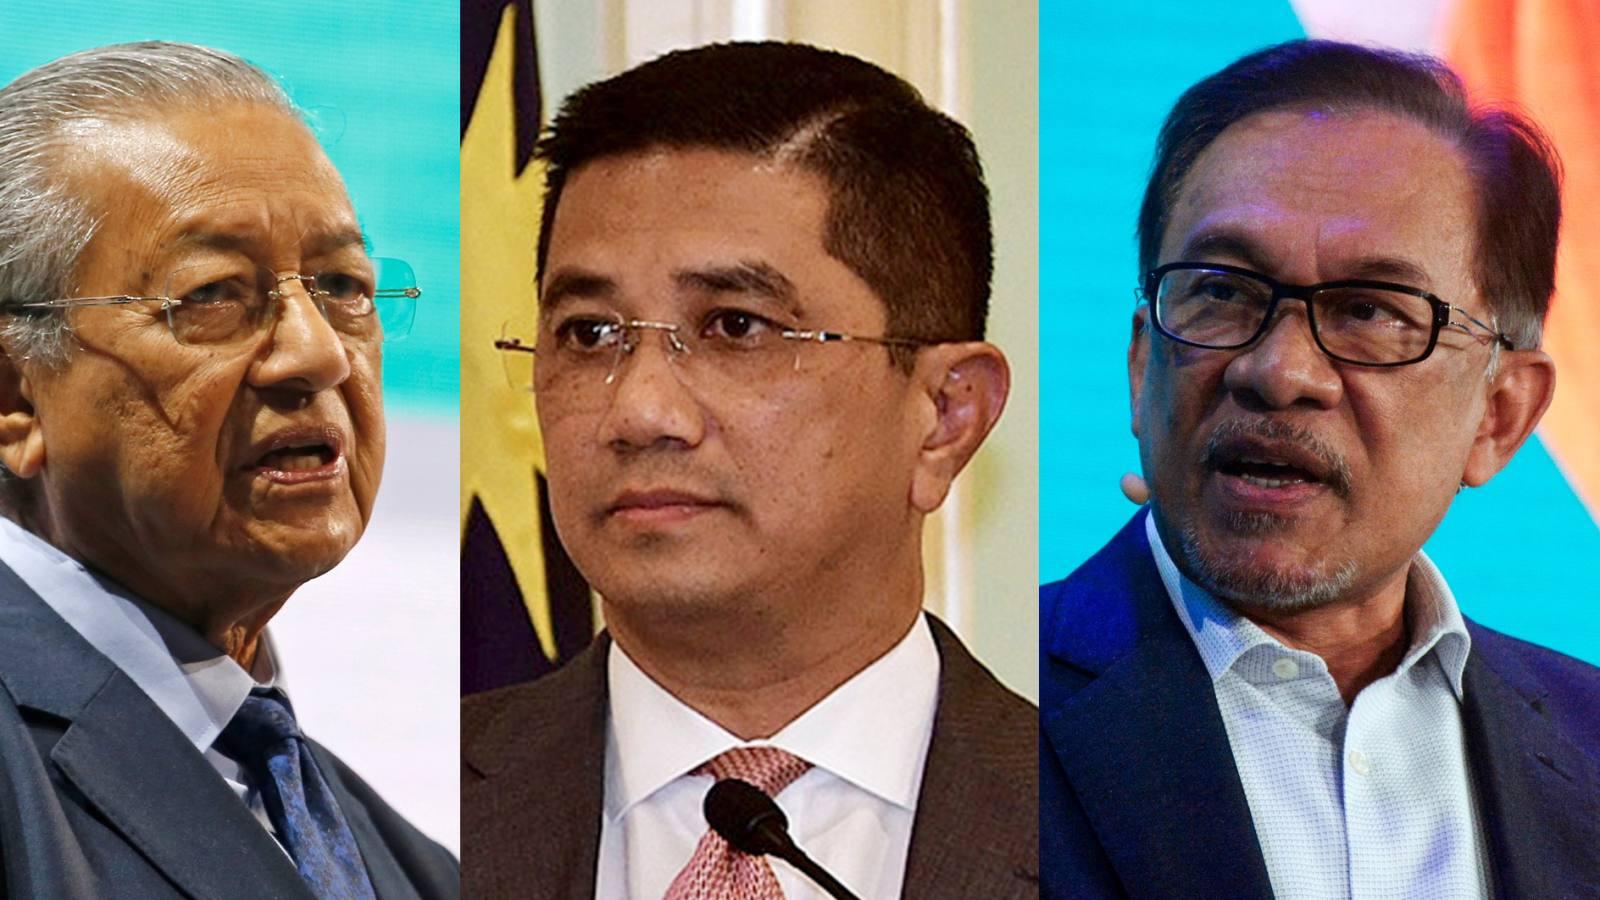 Mahathir's son ready to inherit Malaysia's political legacy - Nikkei